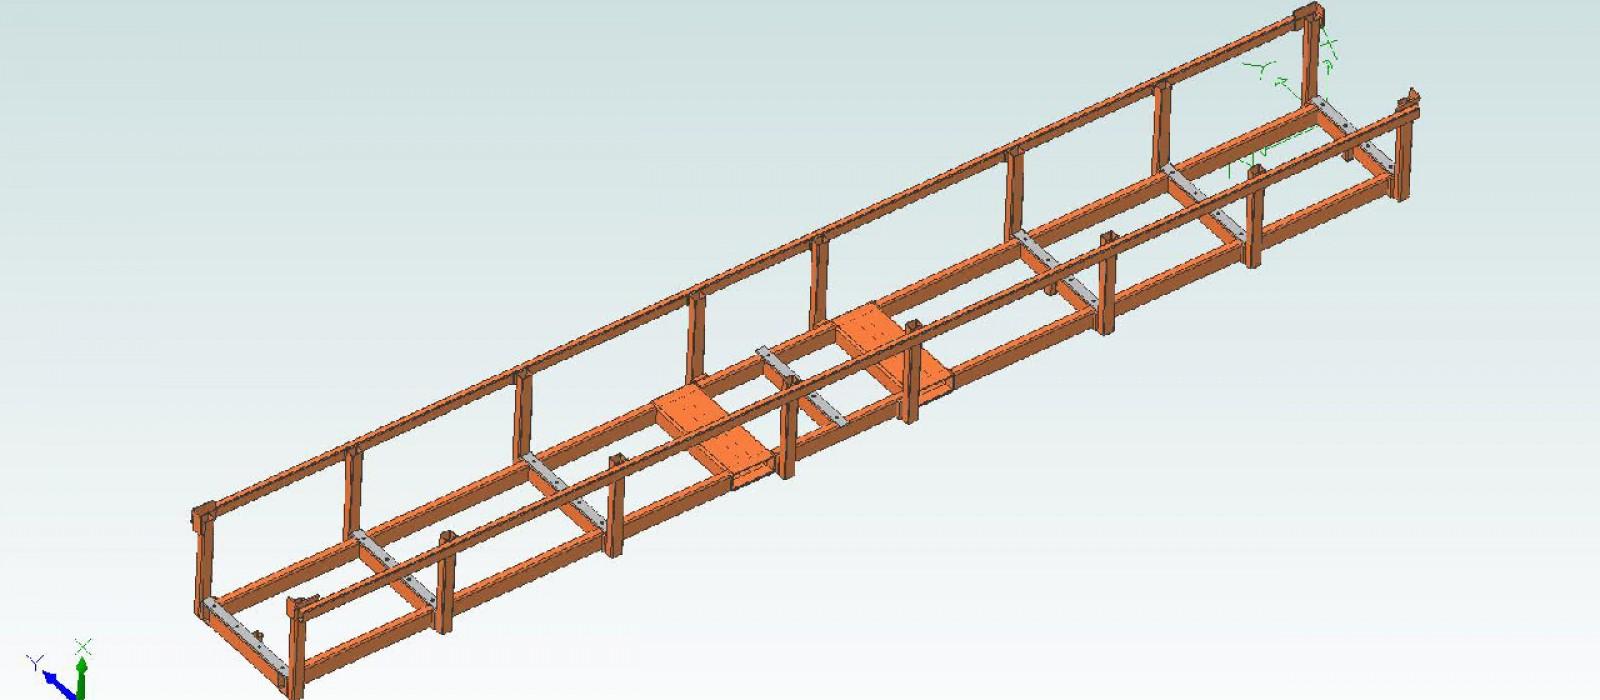 Langgutpalette-6000x750x500